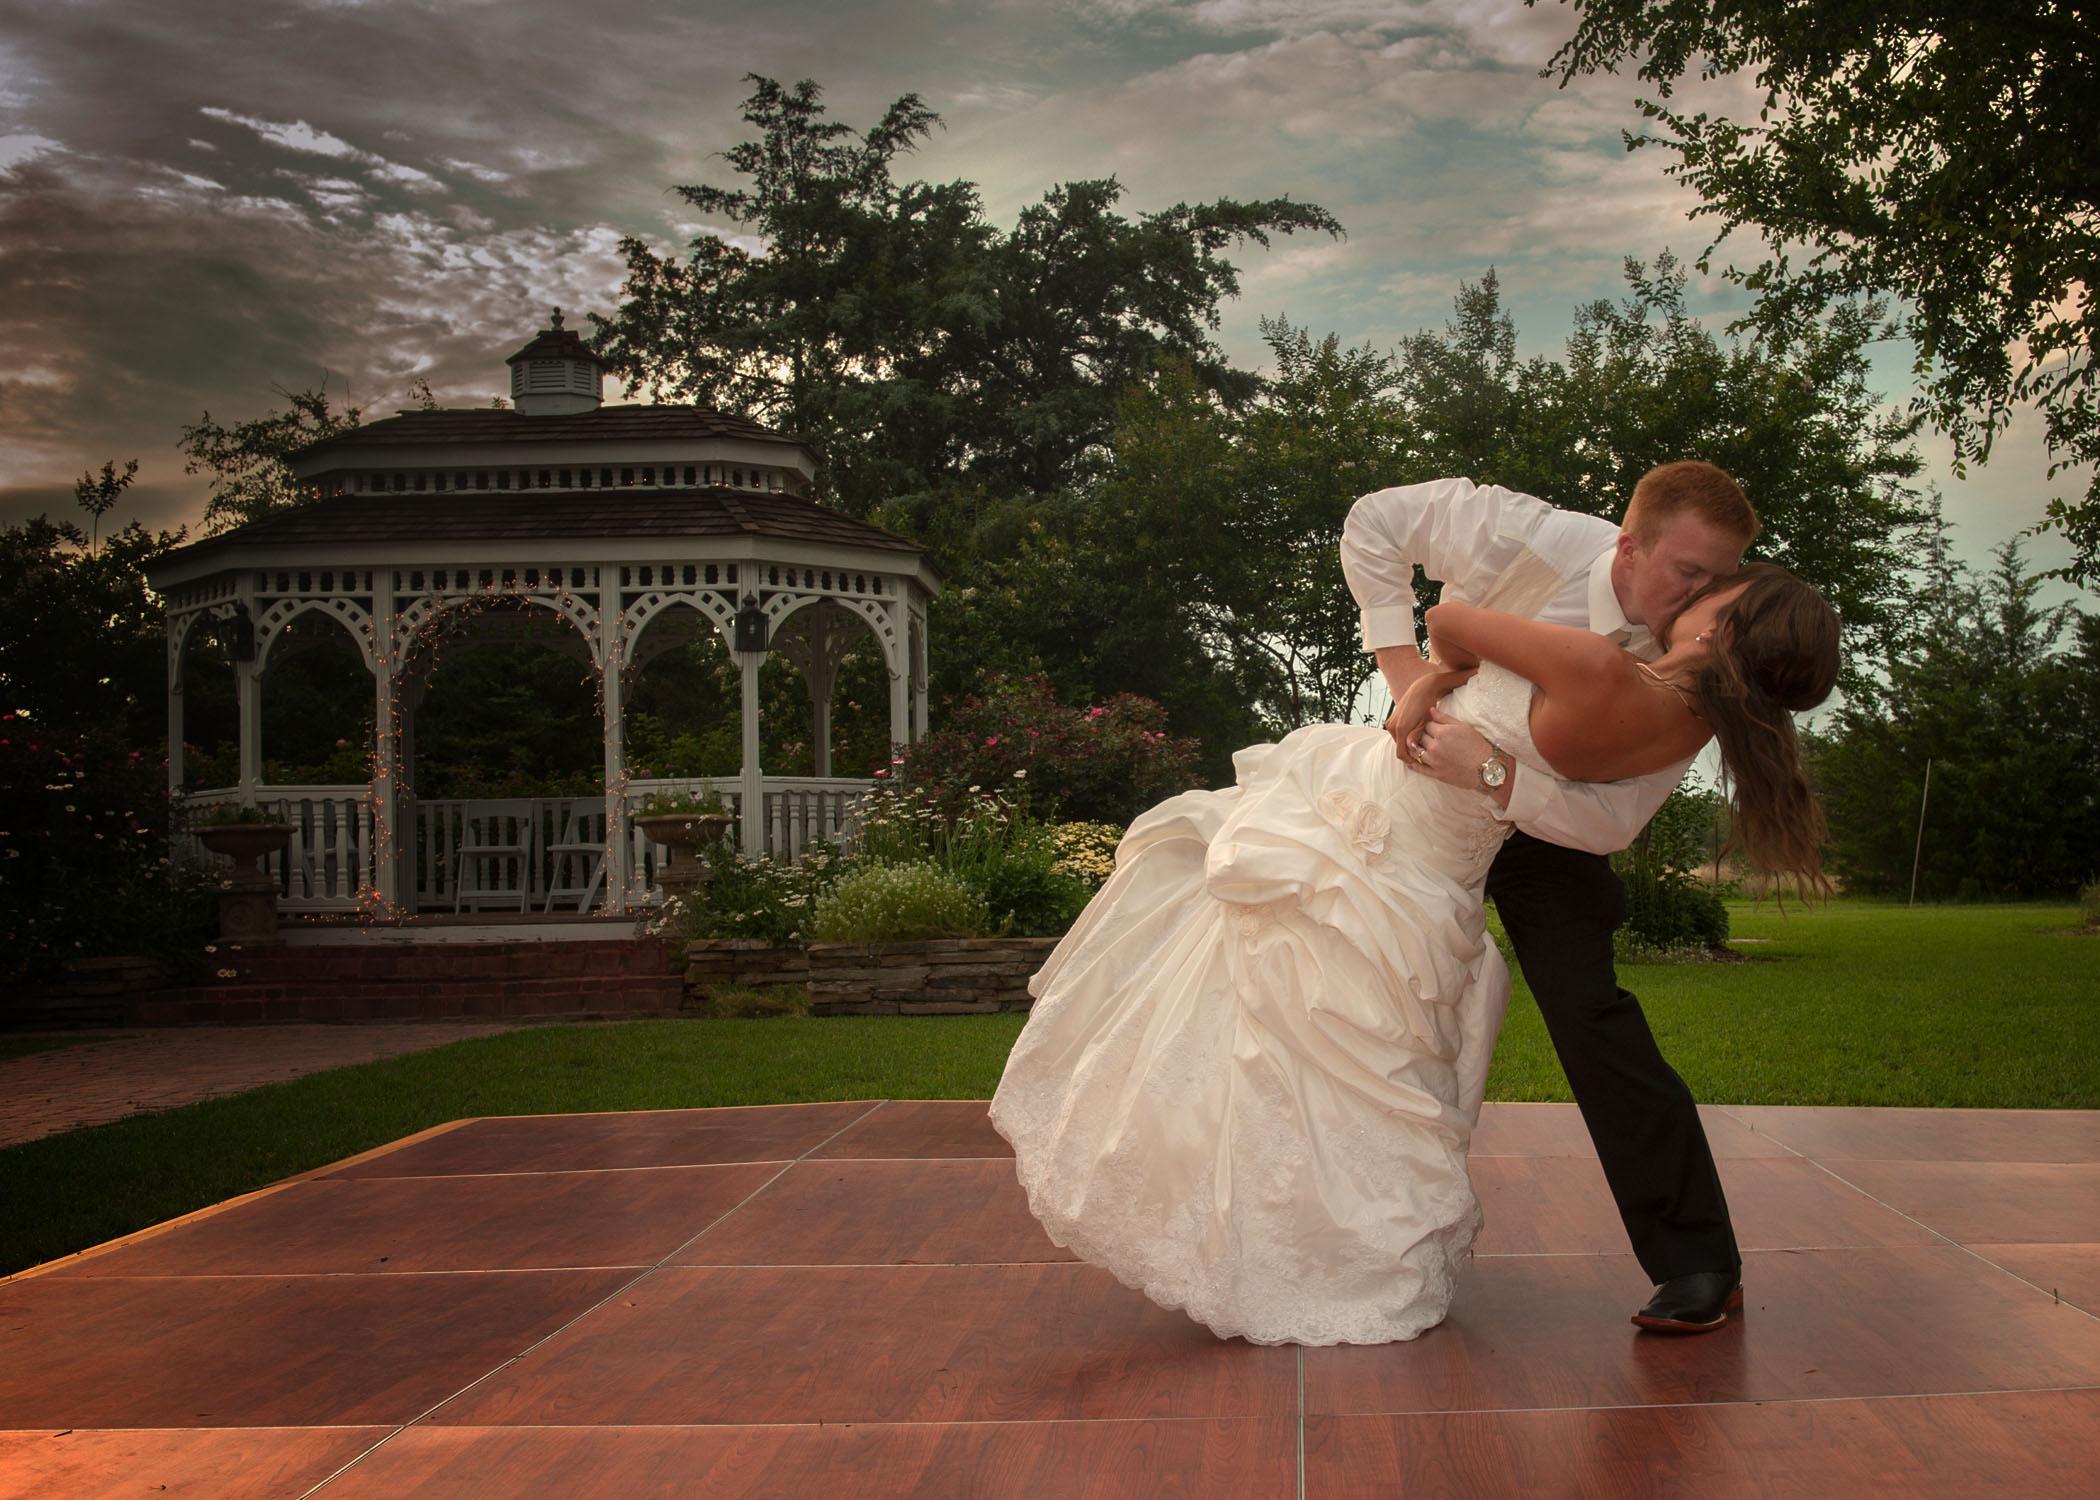 outdoor wedding venue packages